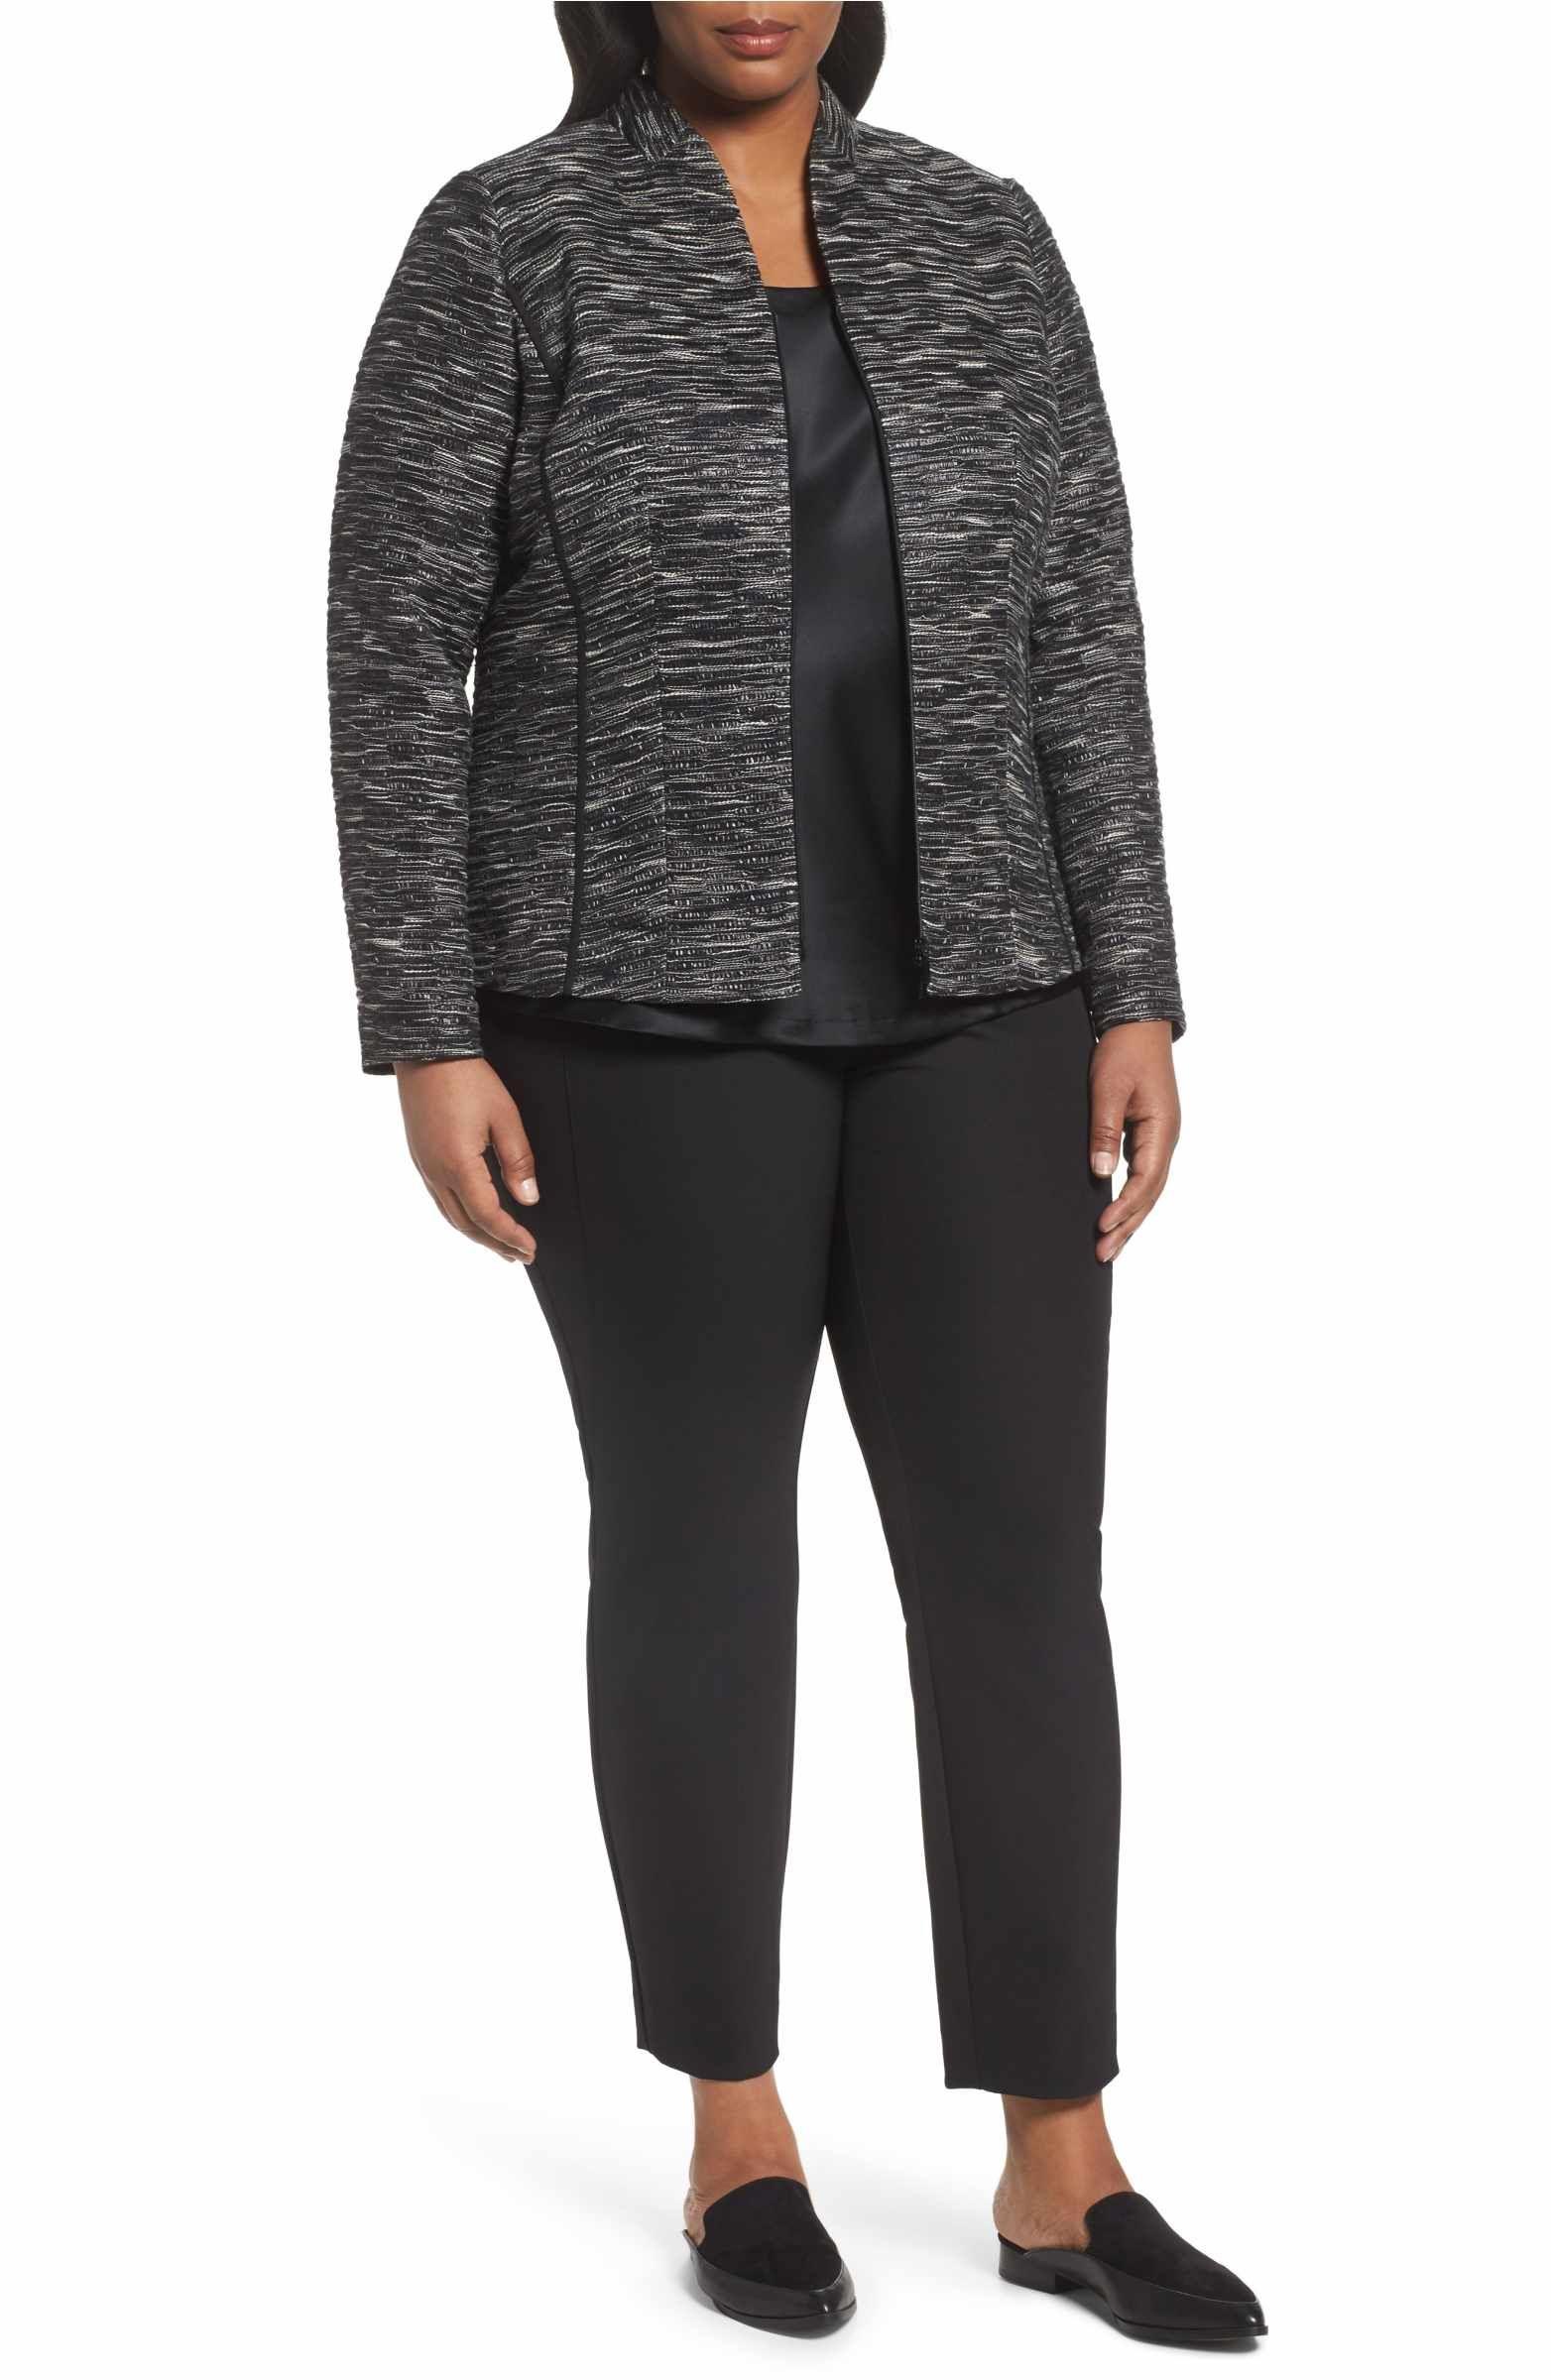 Lafayette 148 New York Meryl Zip Front Jacket (Plus Size